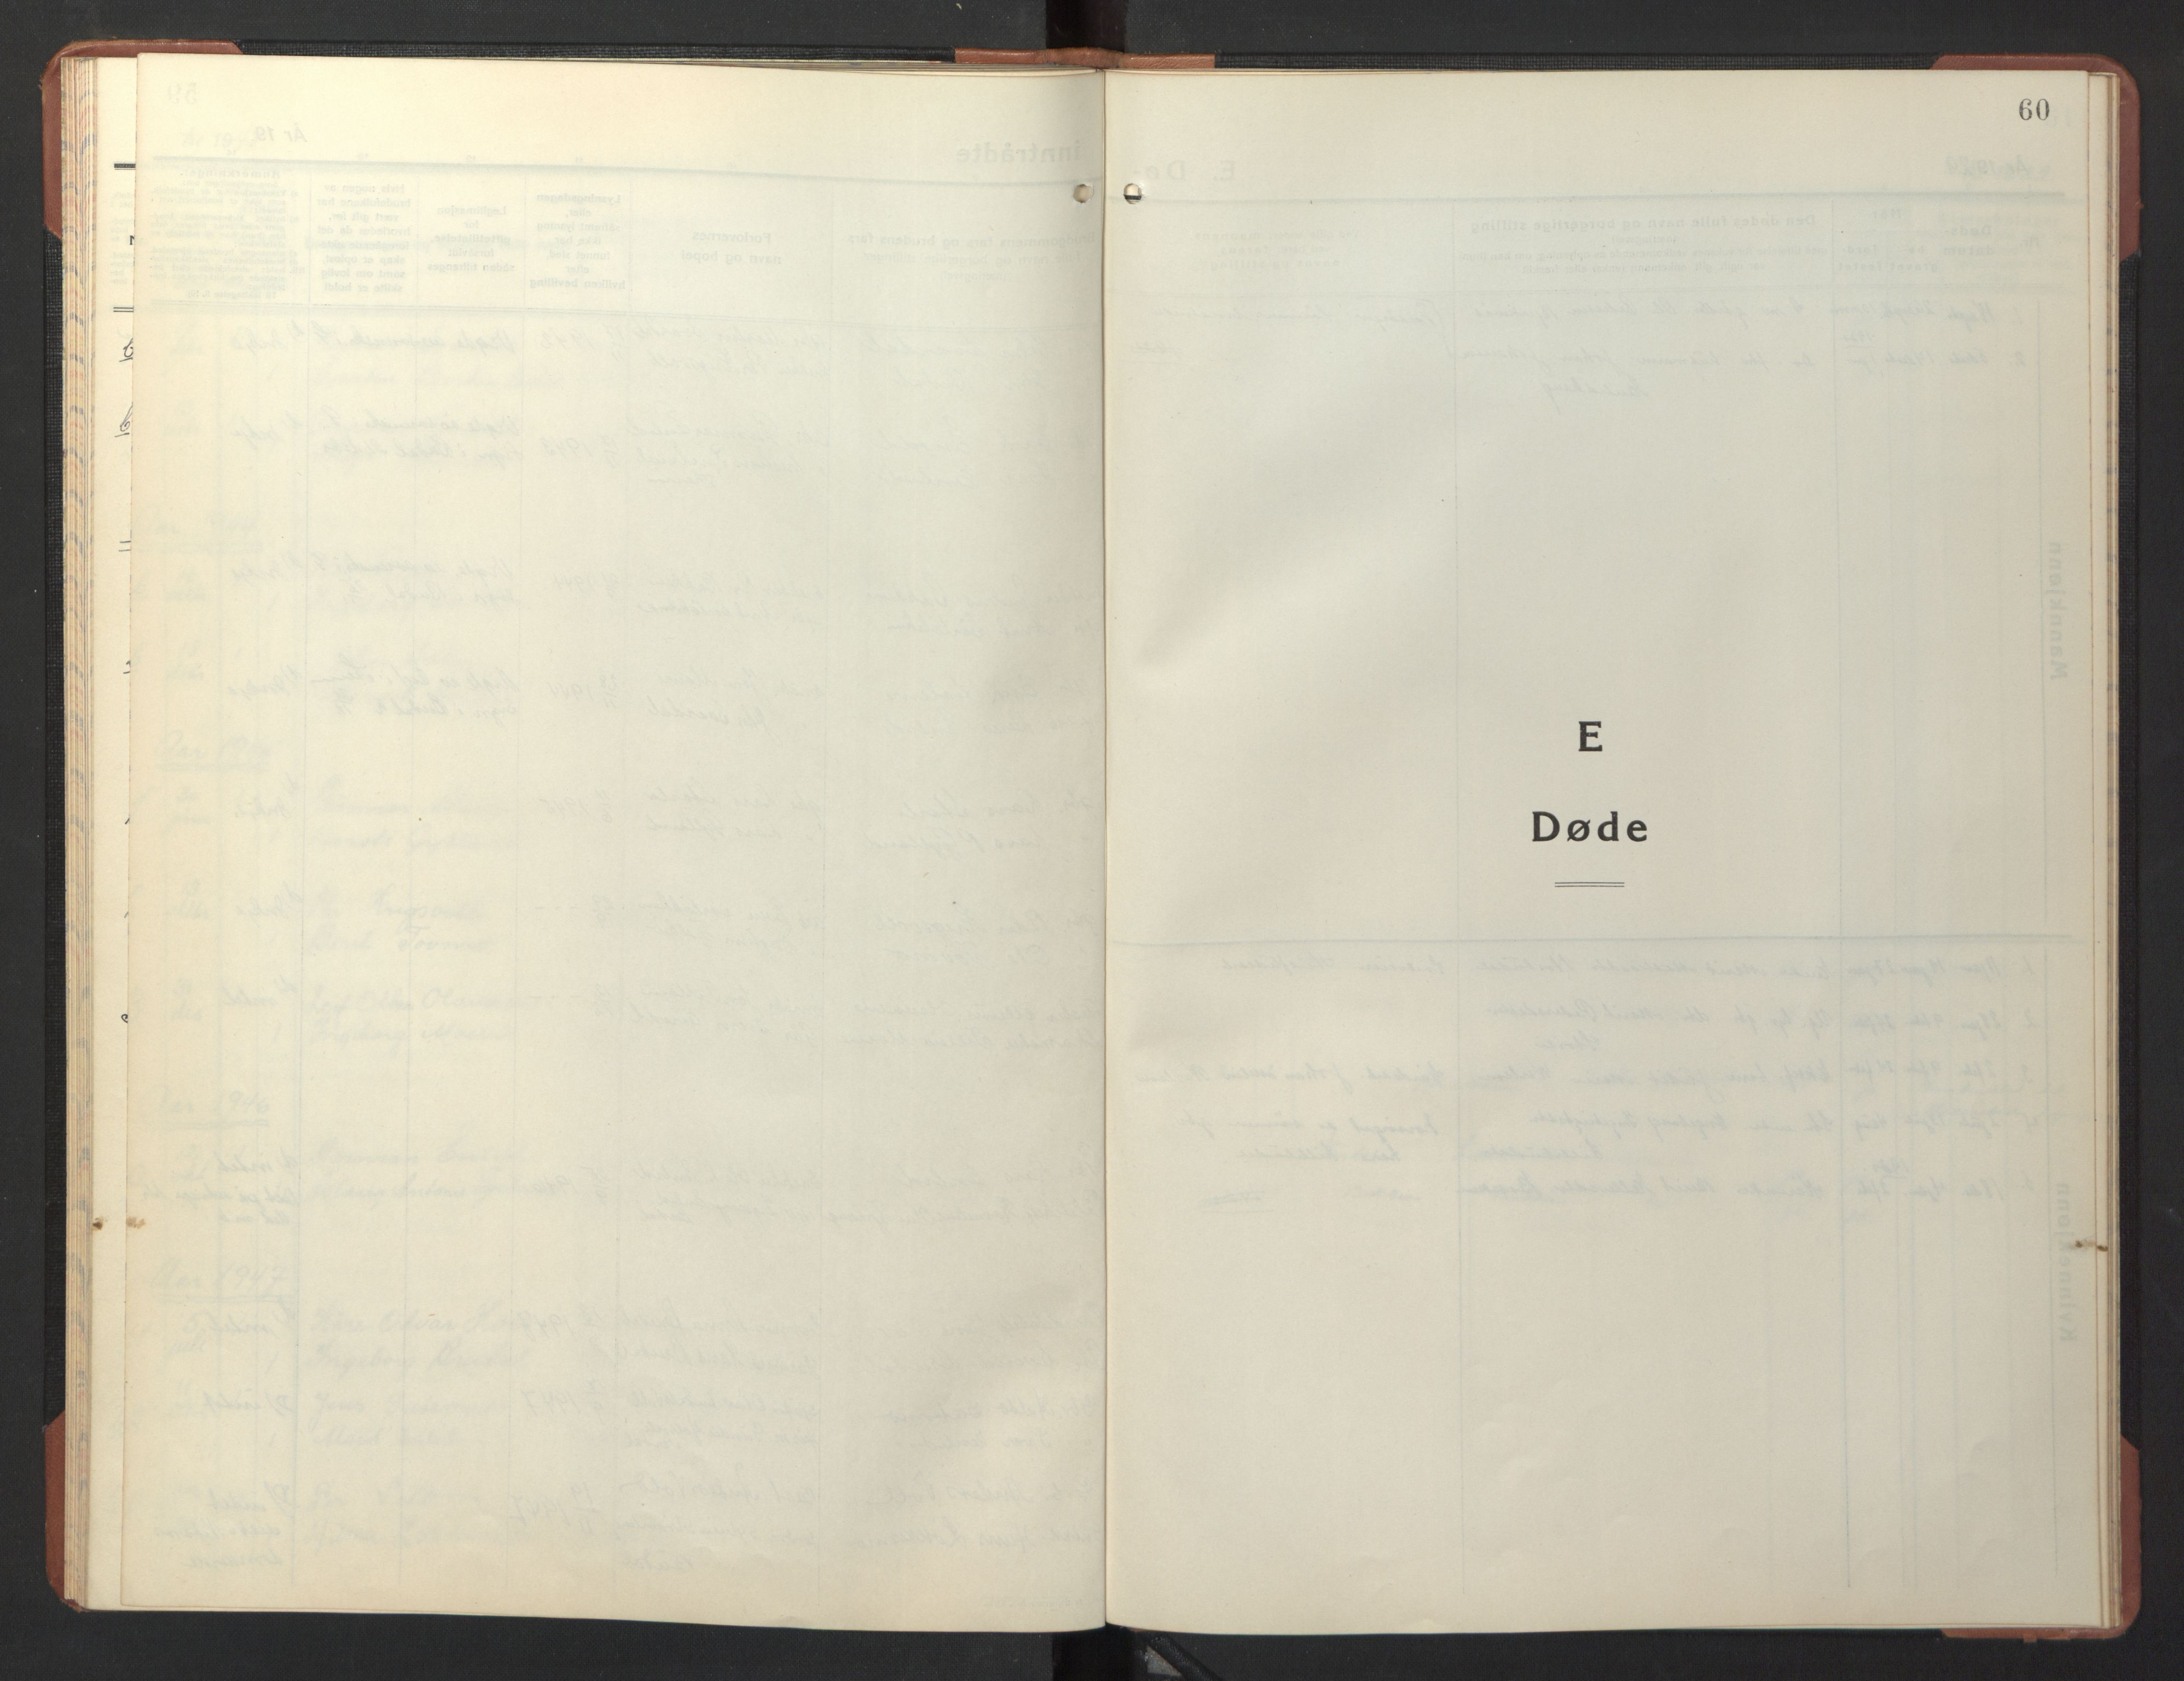 SAT, Ministerialprotokoller, klokkerbøker og fødselsregistre - Sør-Trøndelag, 690/L1053: Parish register (copy) no. 690C03, 1930-1947, p. 60